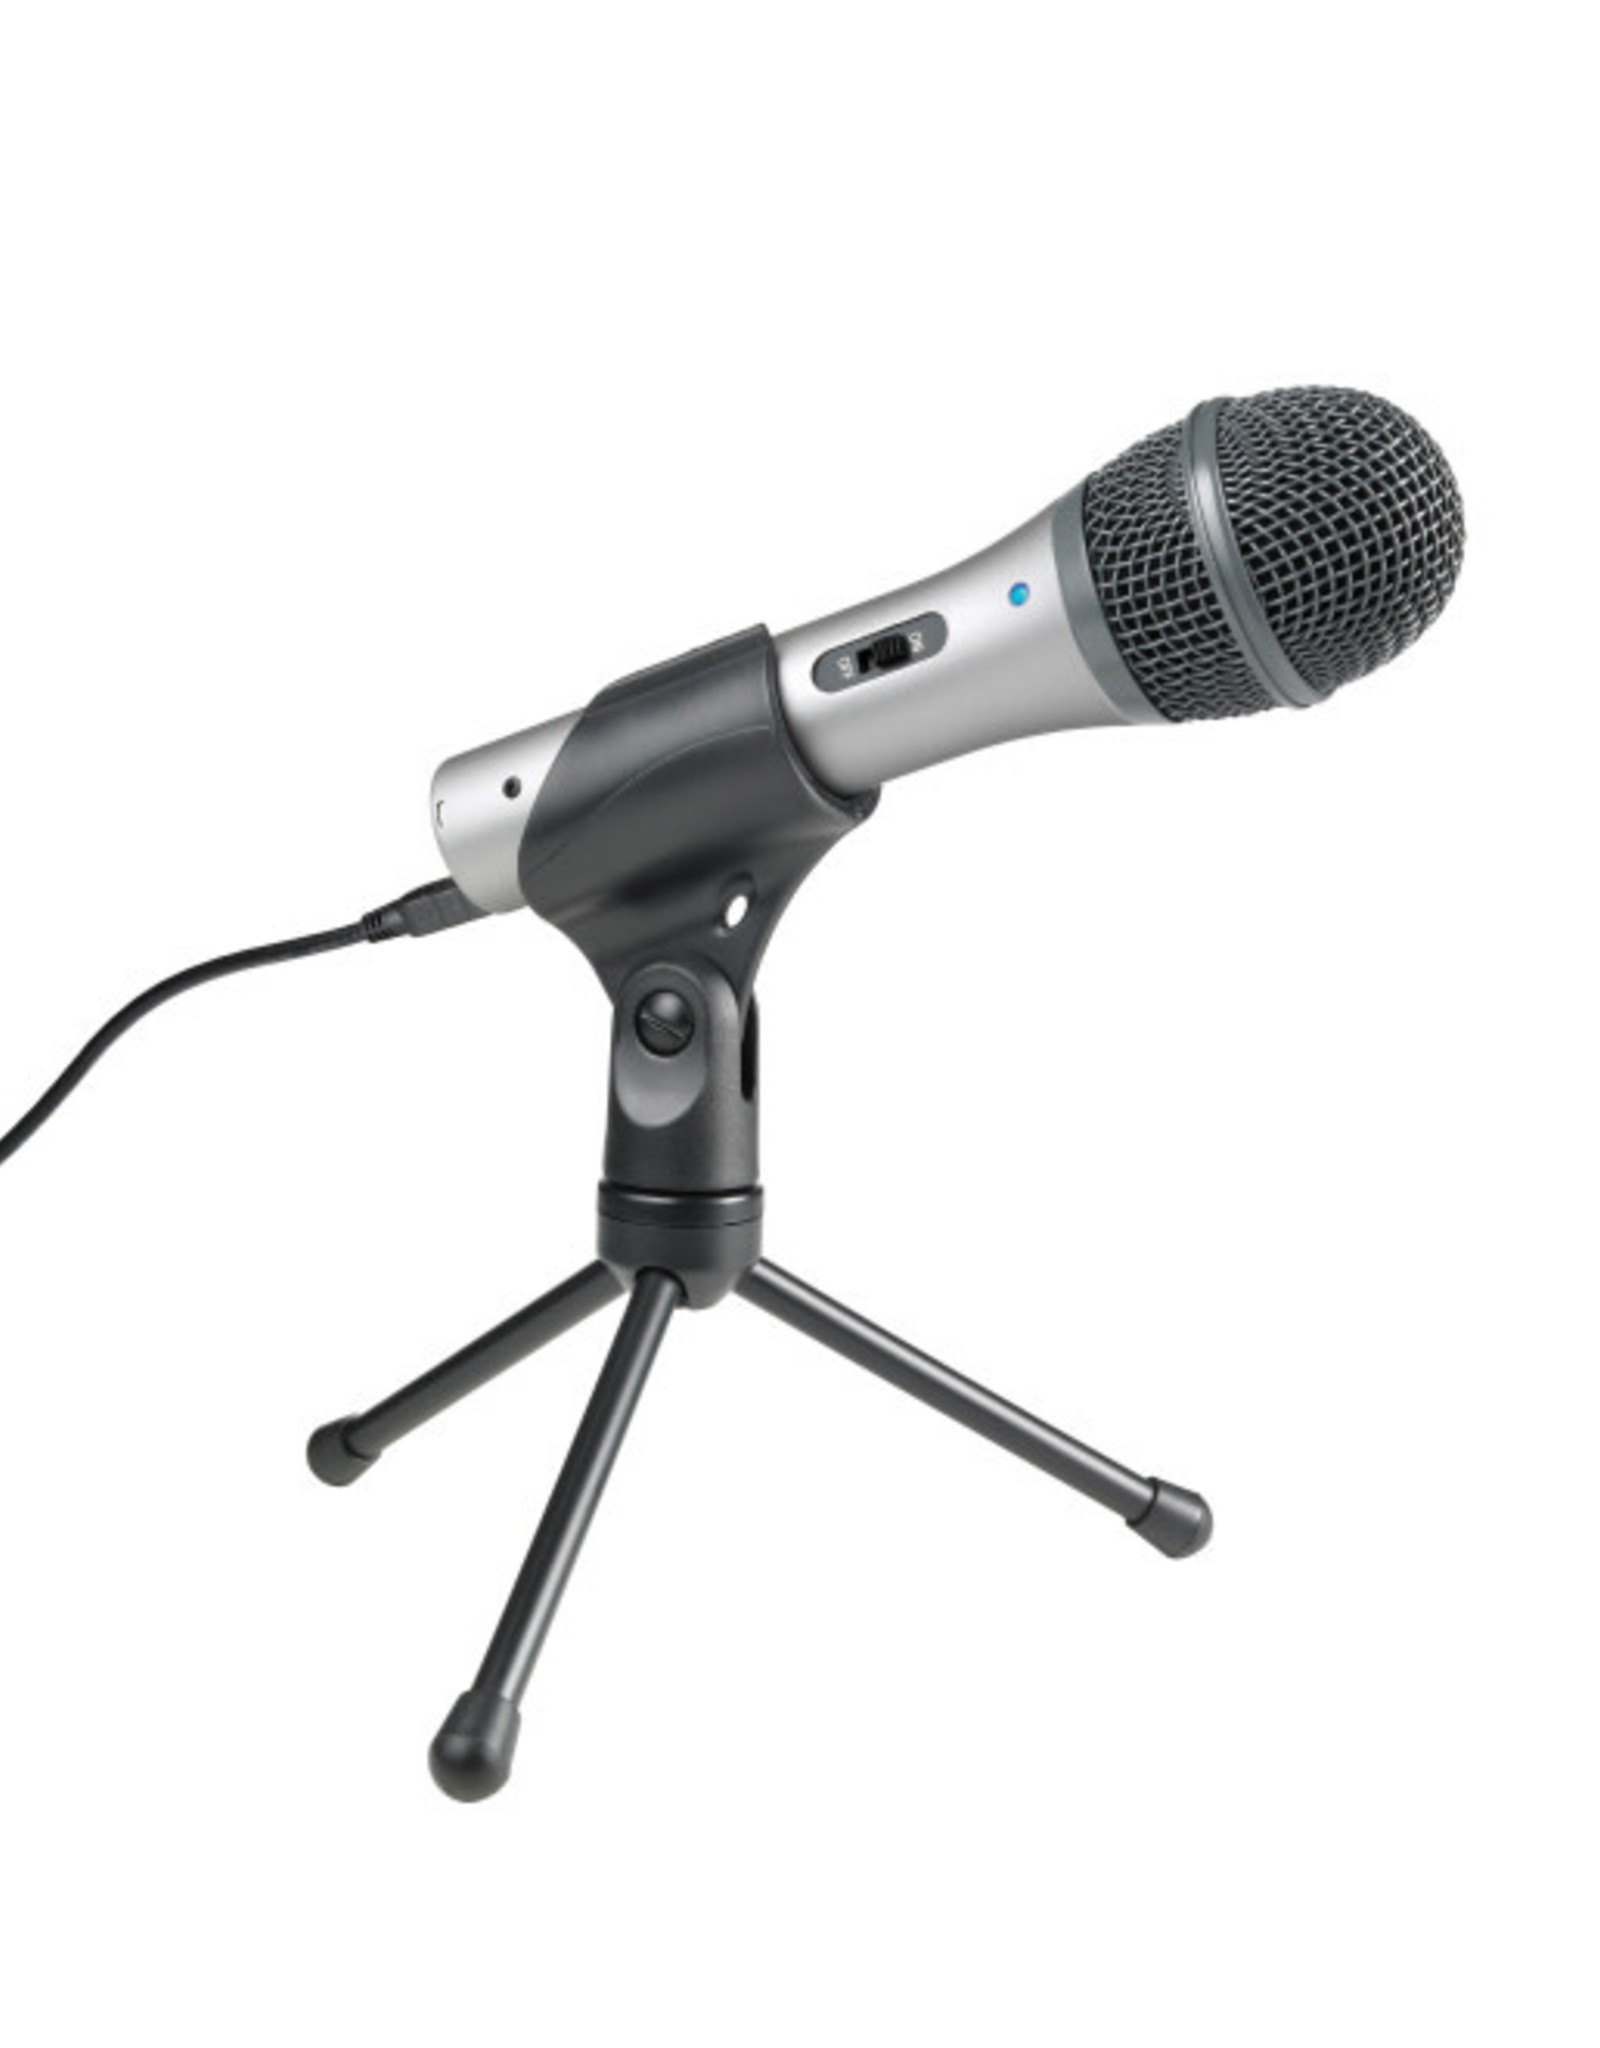 Audio Technica AT(Ea) Handheld USB/XLR Microphone ATR2100USB